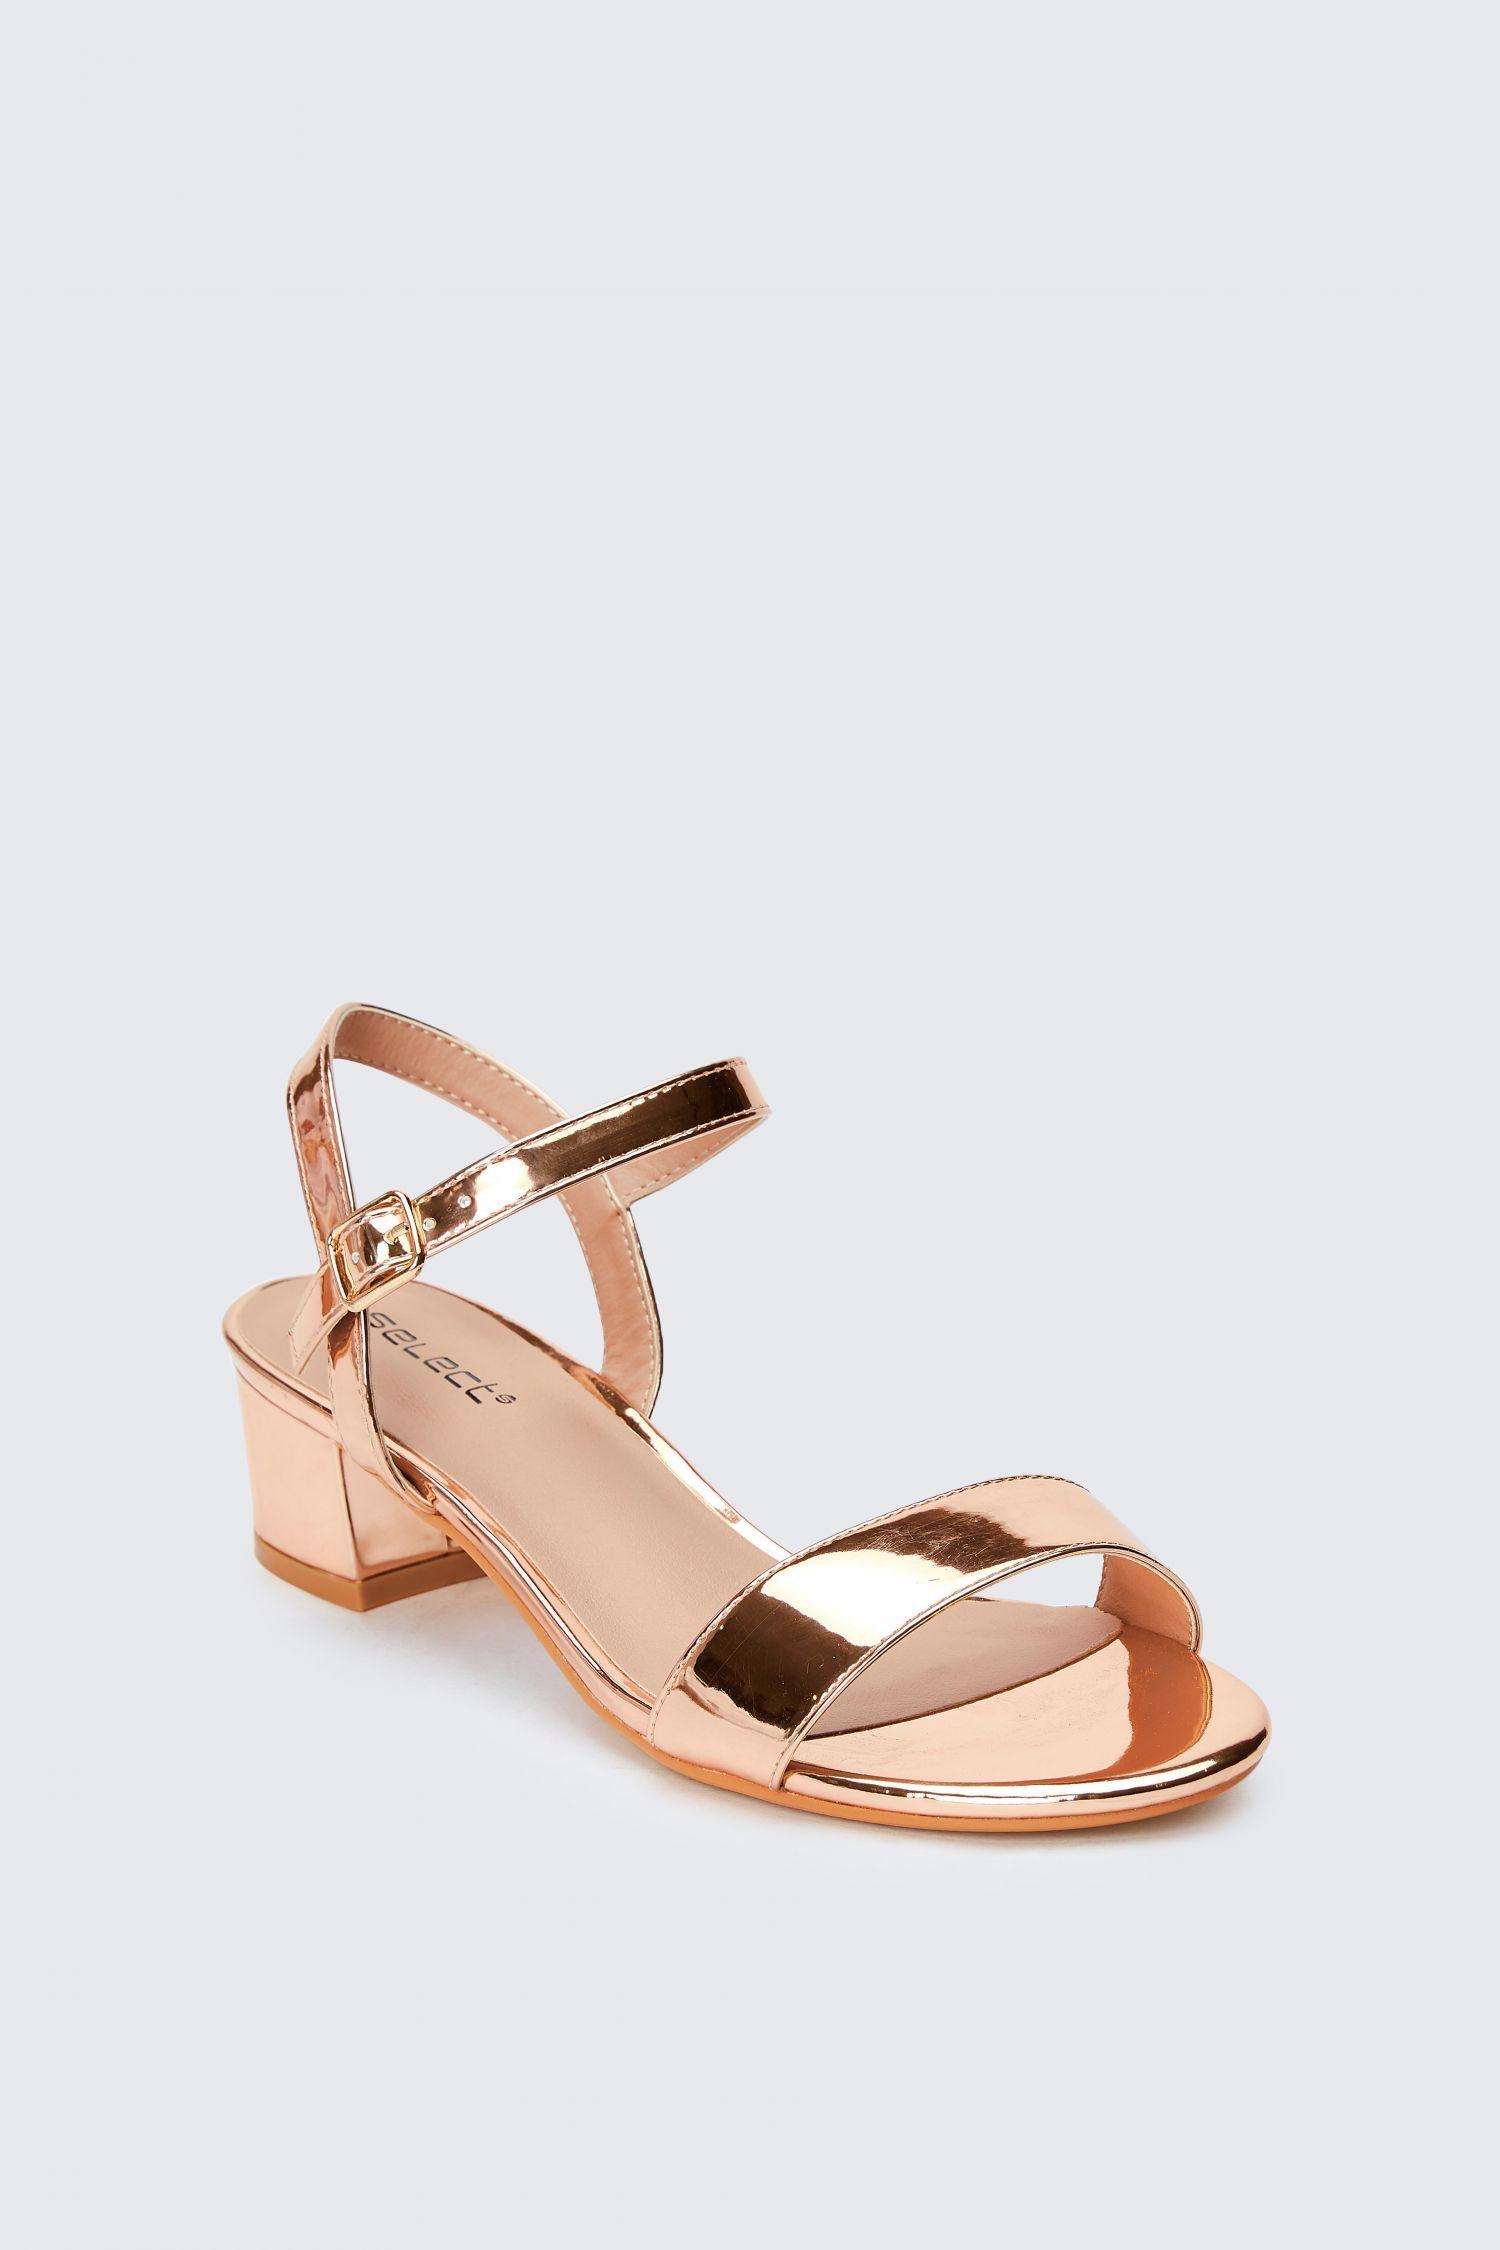 bbb6b90c5cdc4 Metallic Gold Low Block Heel Sandals - Gold Sandals | Select in 2019 ...